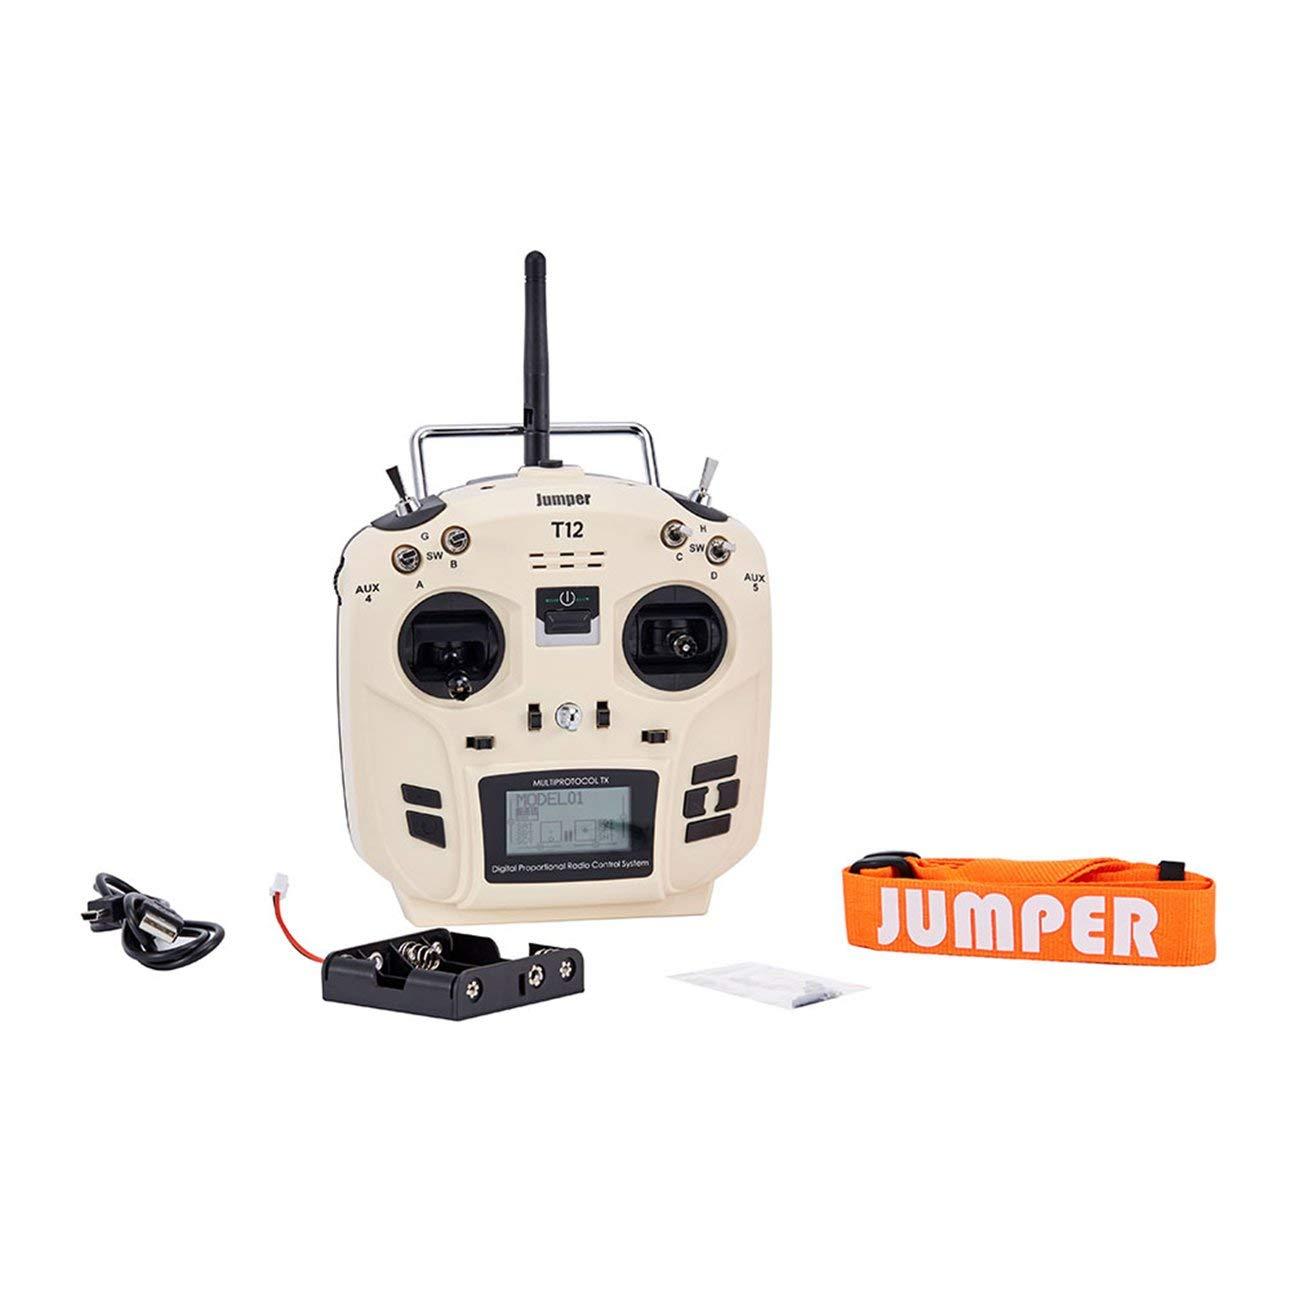 Liobaba Jumper OpenTX 12ch Transmitter Radio JP4-in-1 Multi-Protocol RF Module White